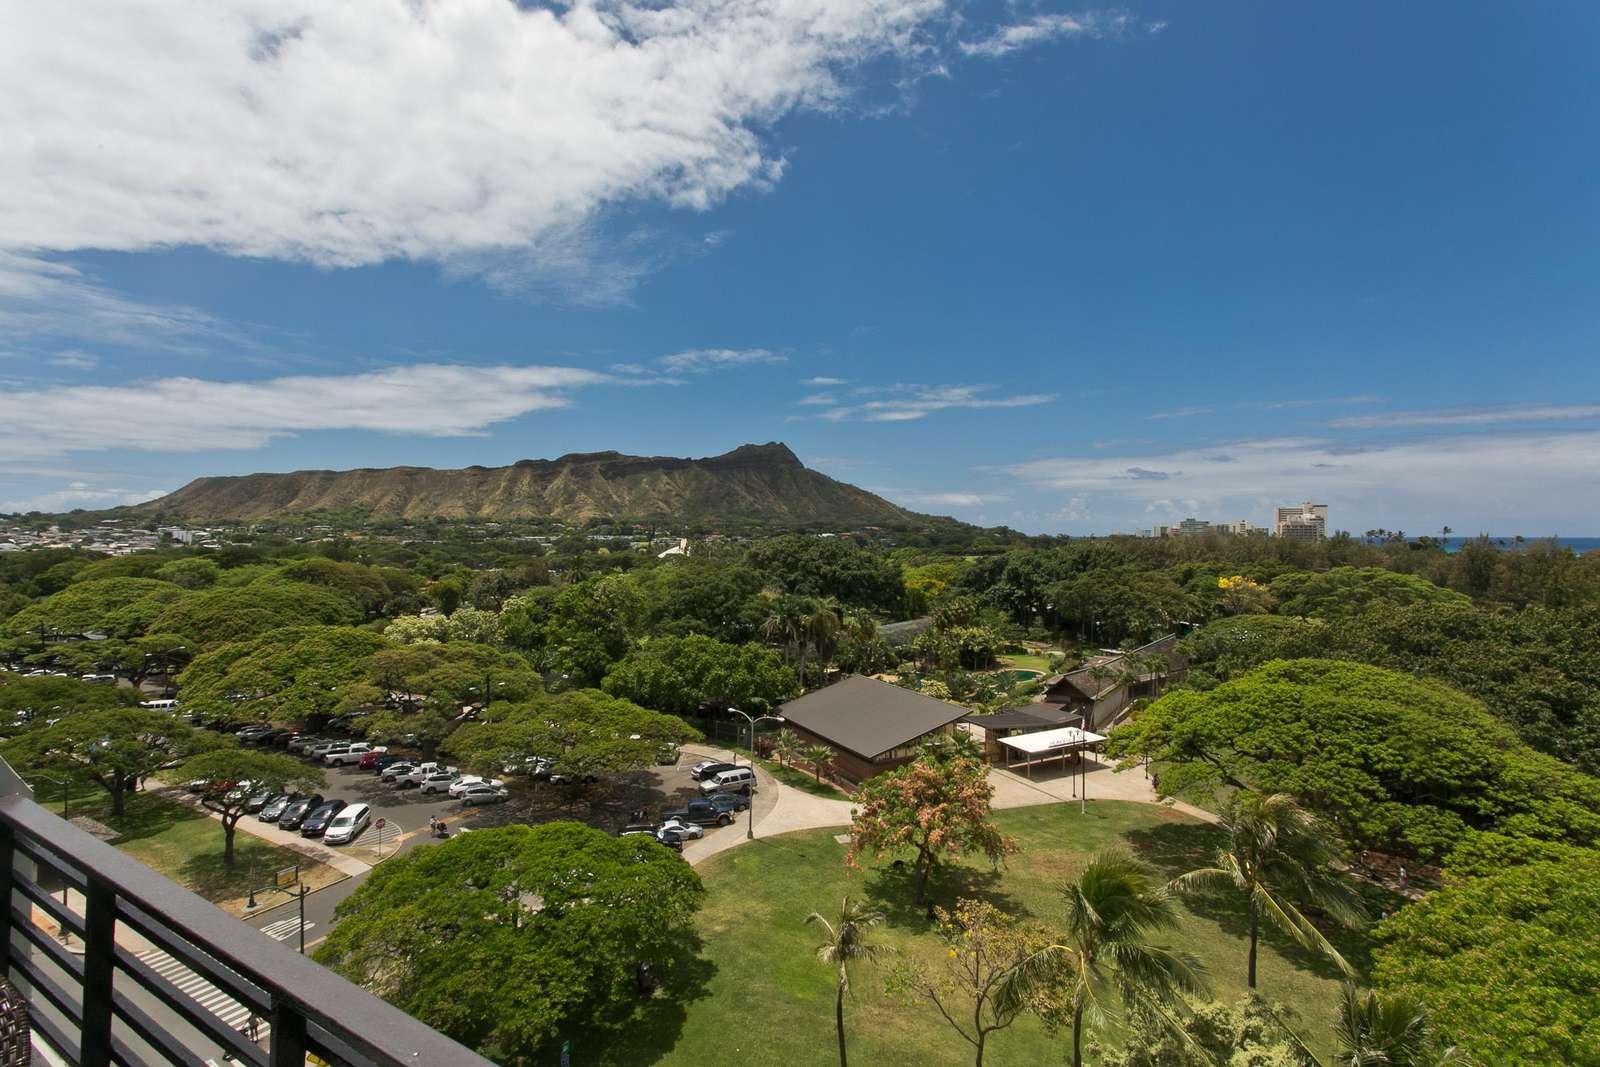 Yes, that's Honolulu Zoo below you